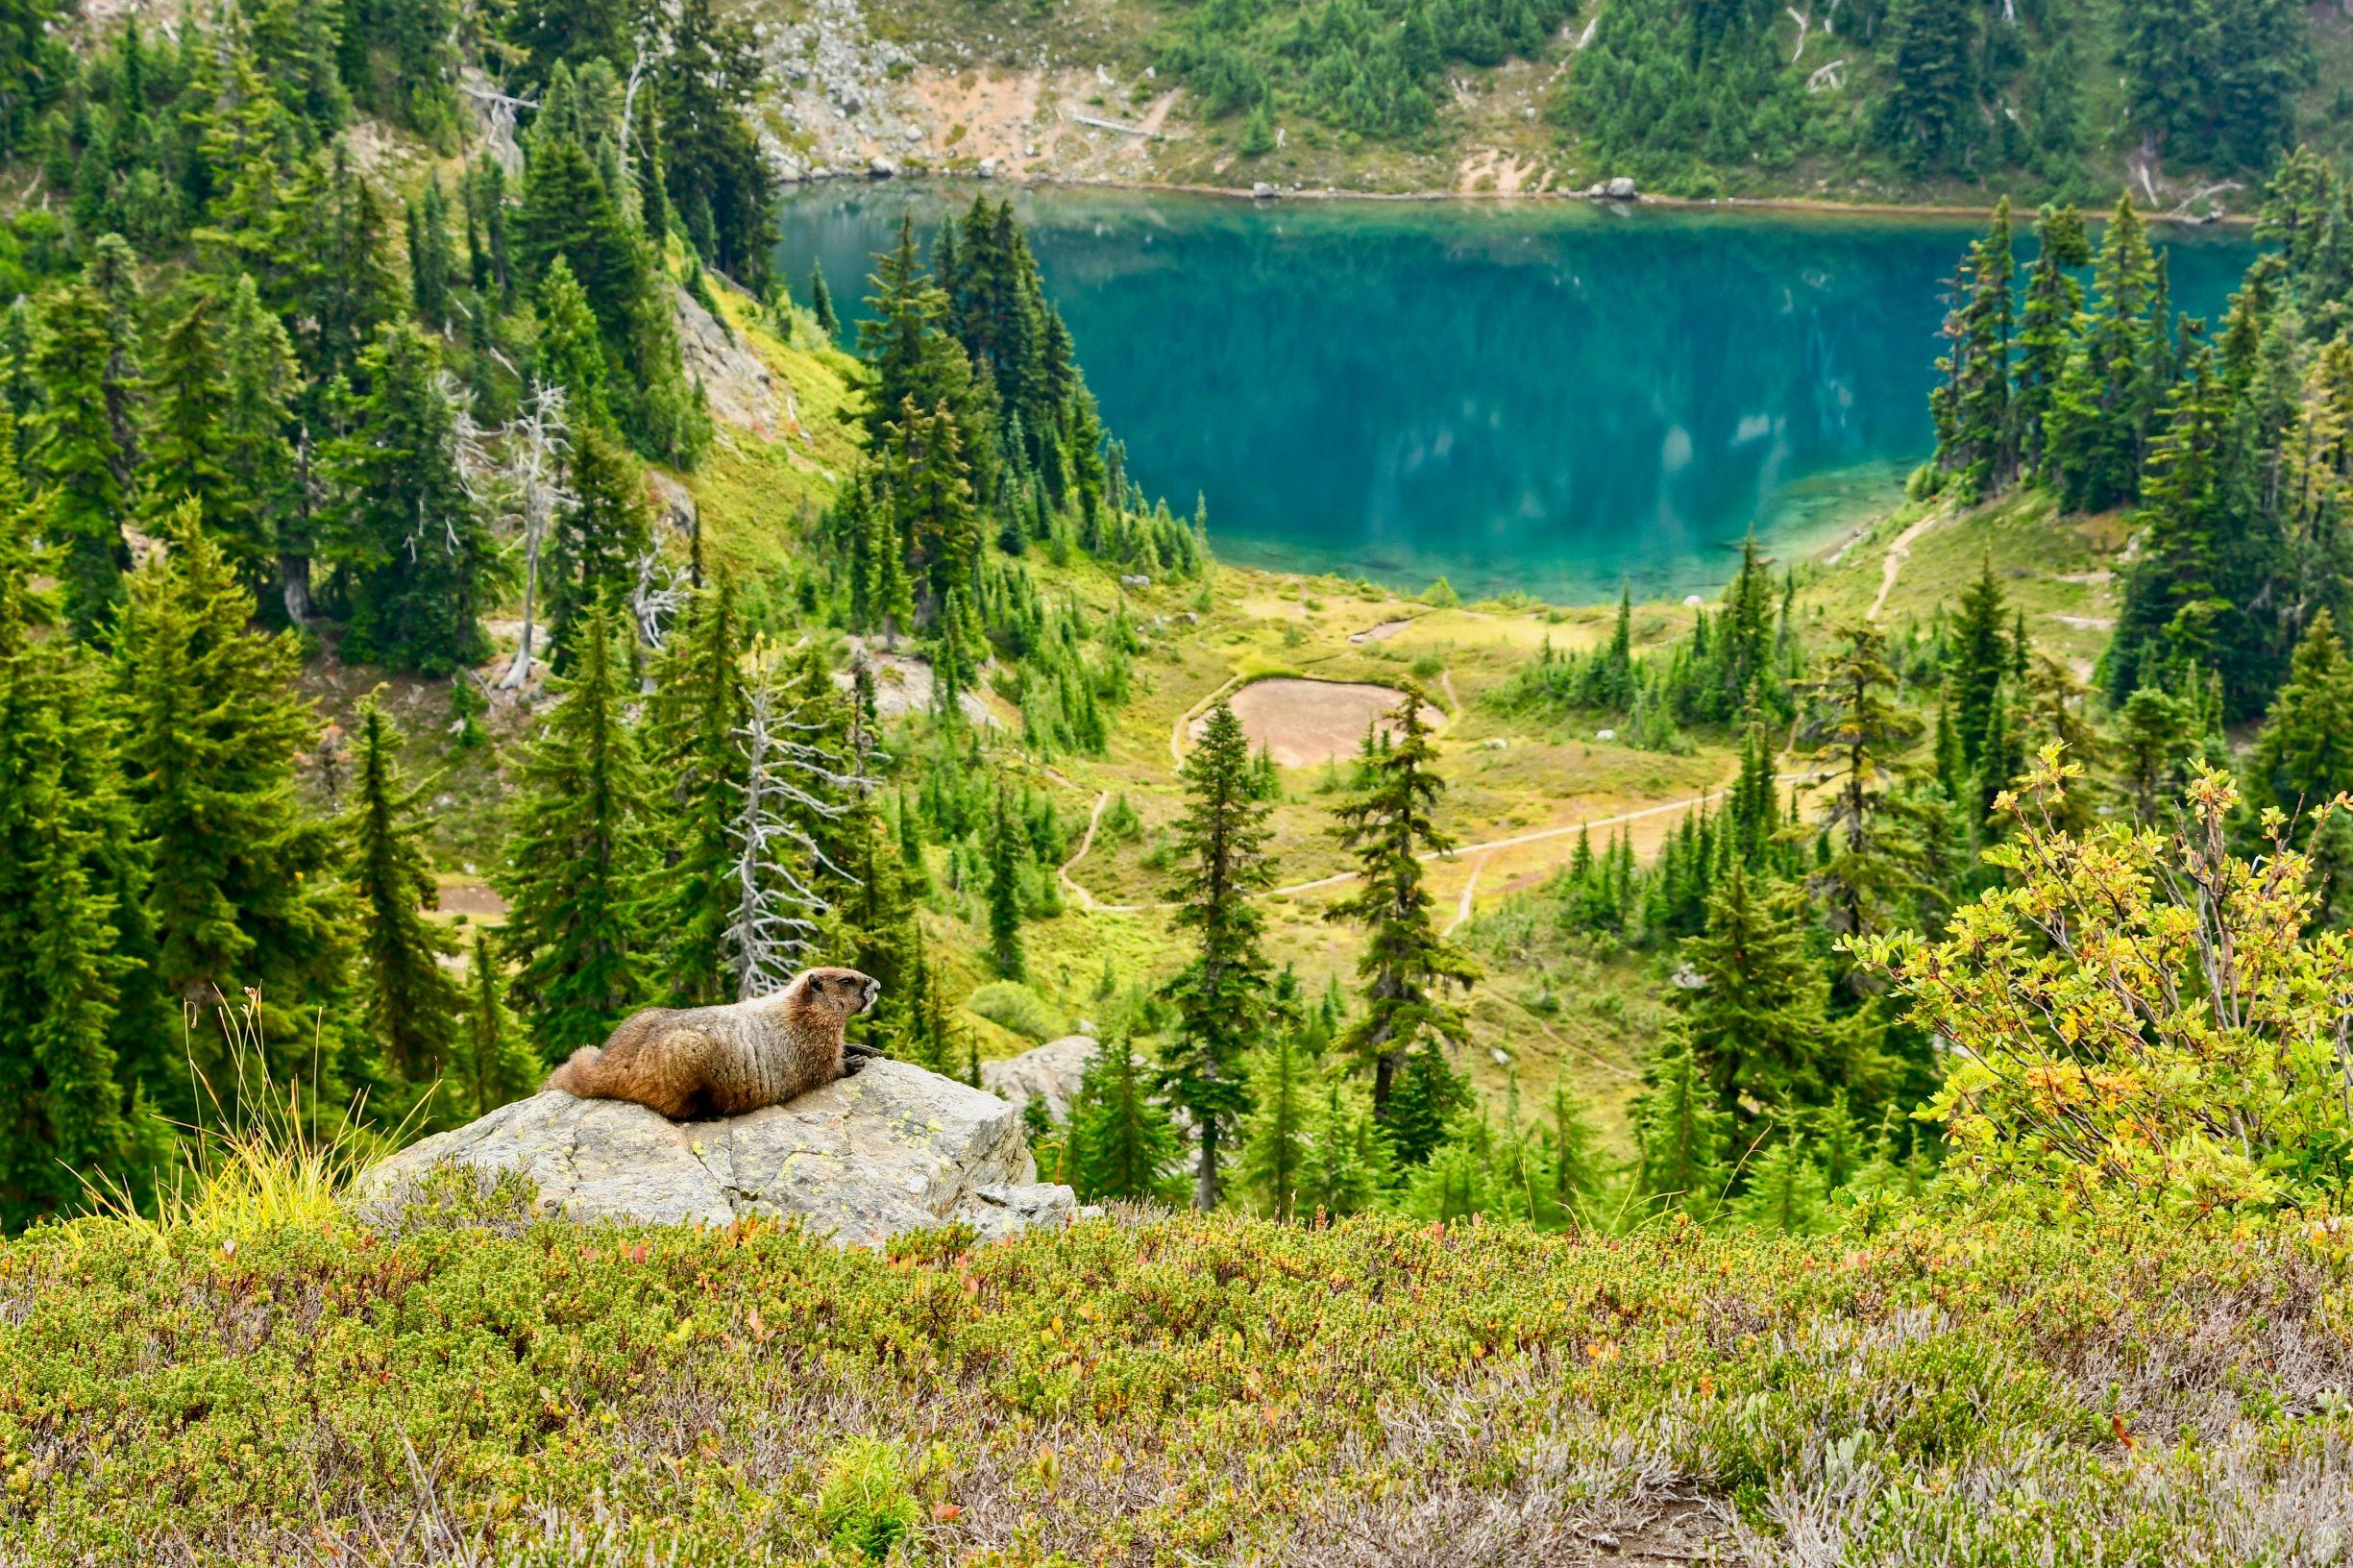 Marmot at Peggy's Pond. Photo by Doug Diekema.